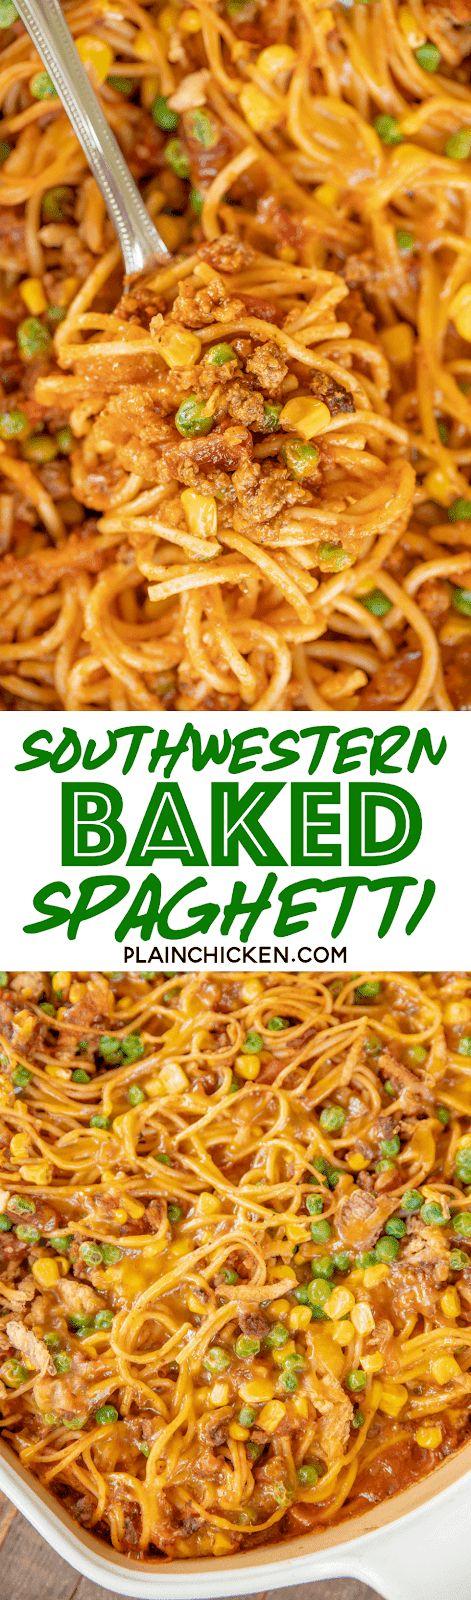 Southwestern Baked Spaghetti Recipe – great make-ahead dinner! Baked spaghetti l…